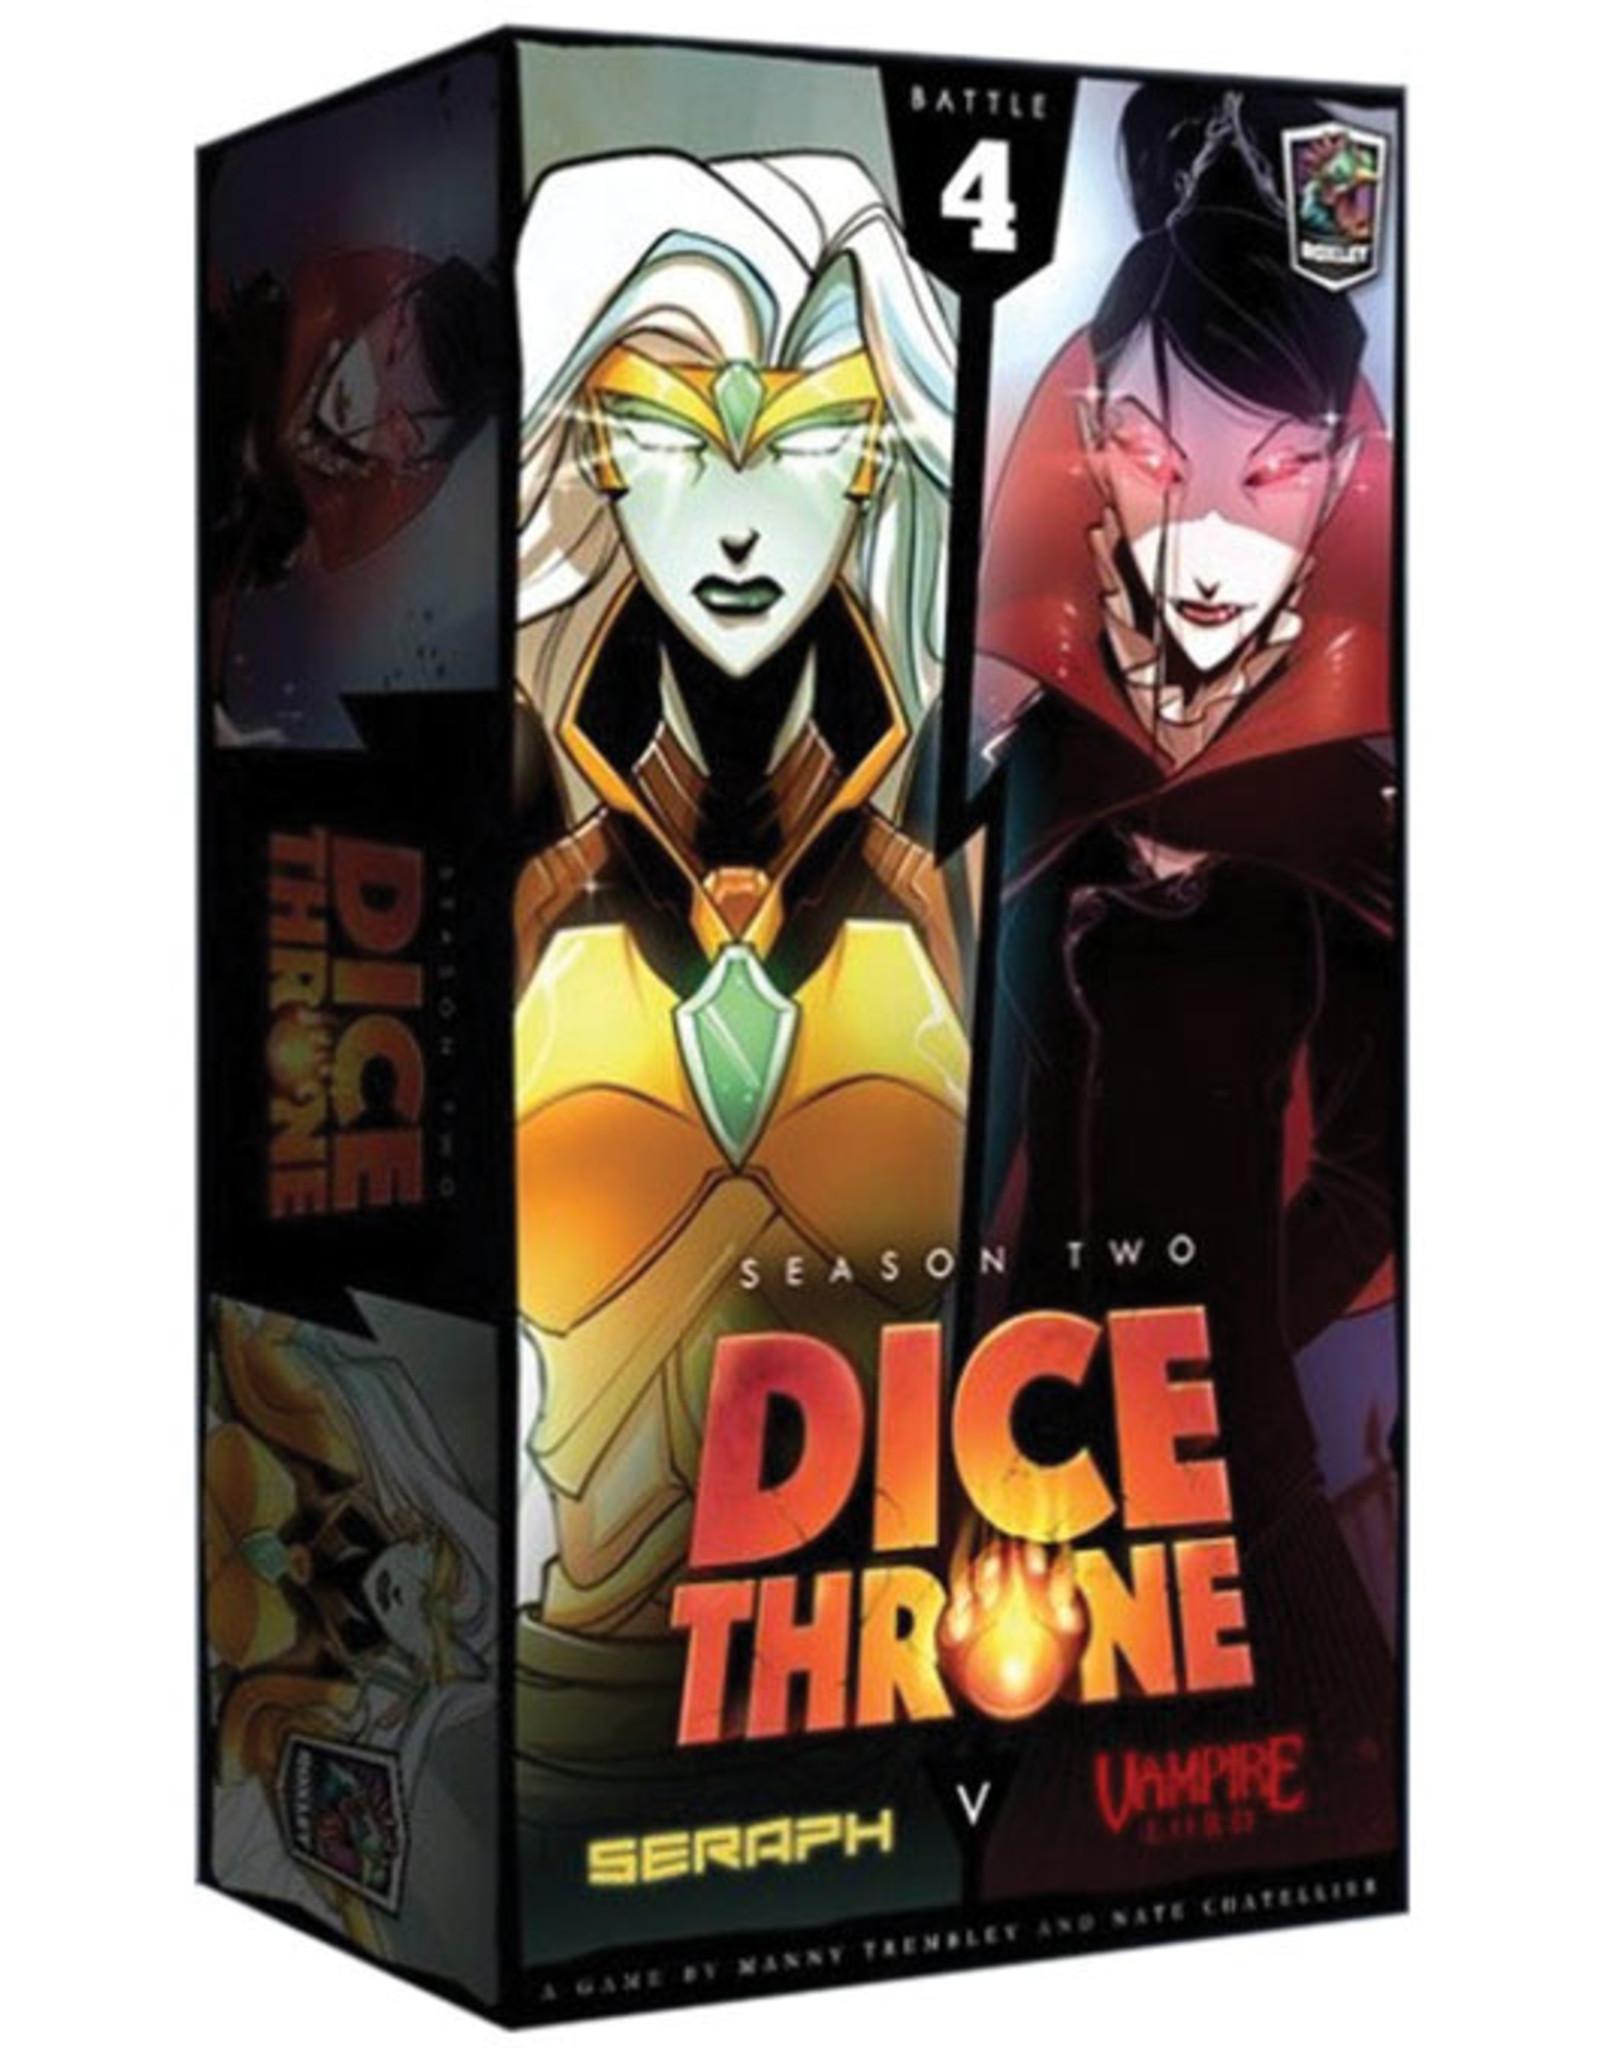 Roxley Dice Throne Season 2 Box 4